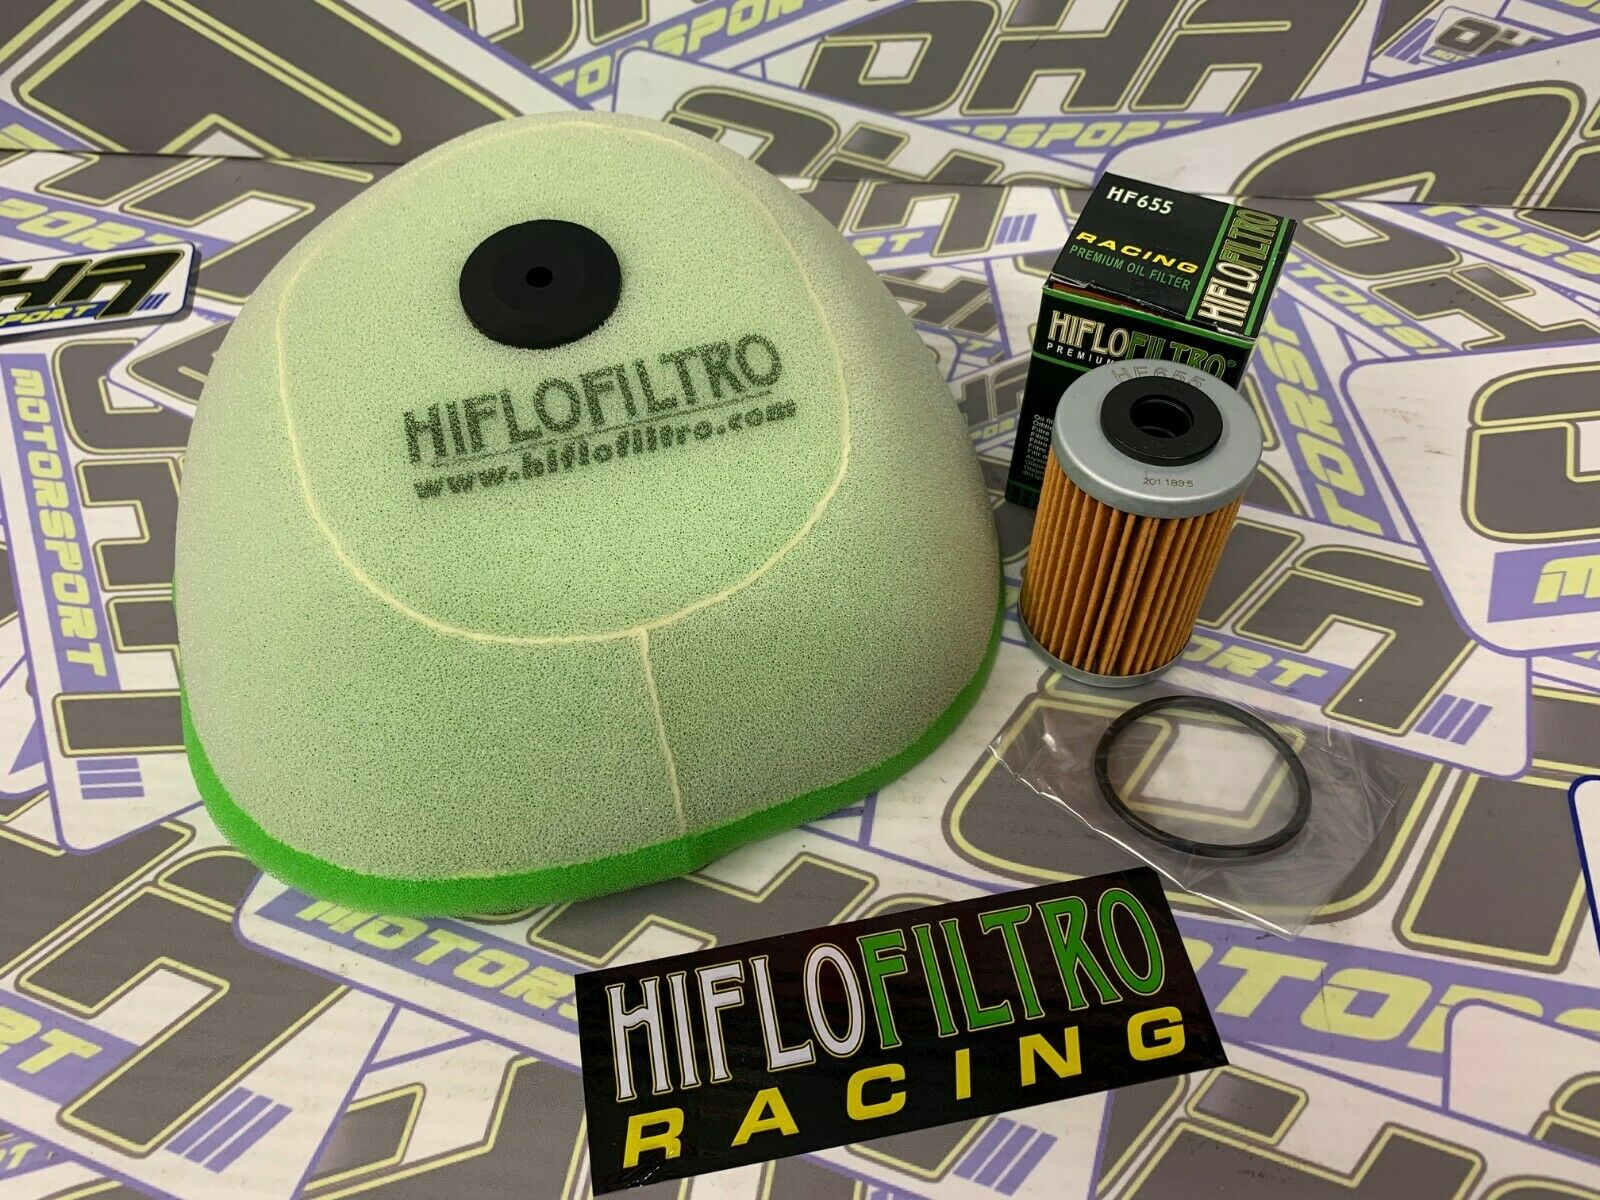 HIFLO AIR FILTER FITS KTM 450 SMR 2011-2012